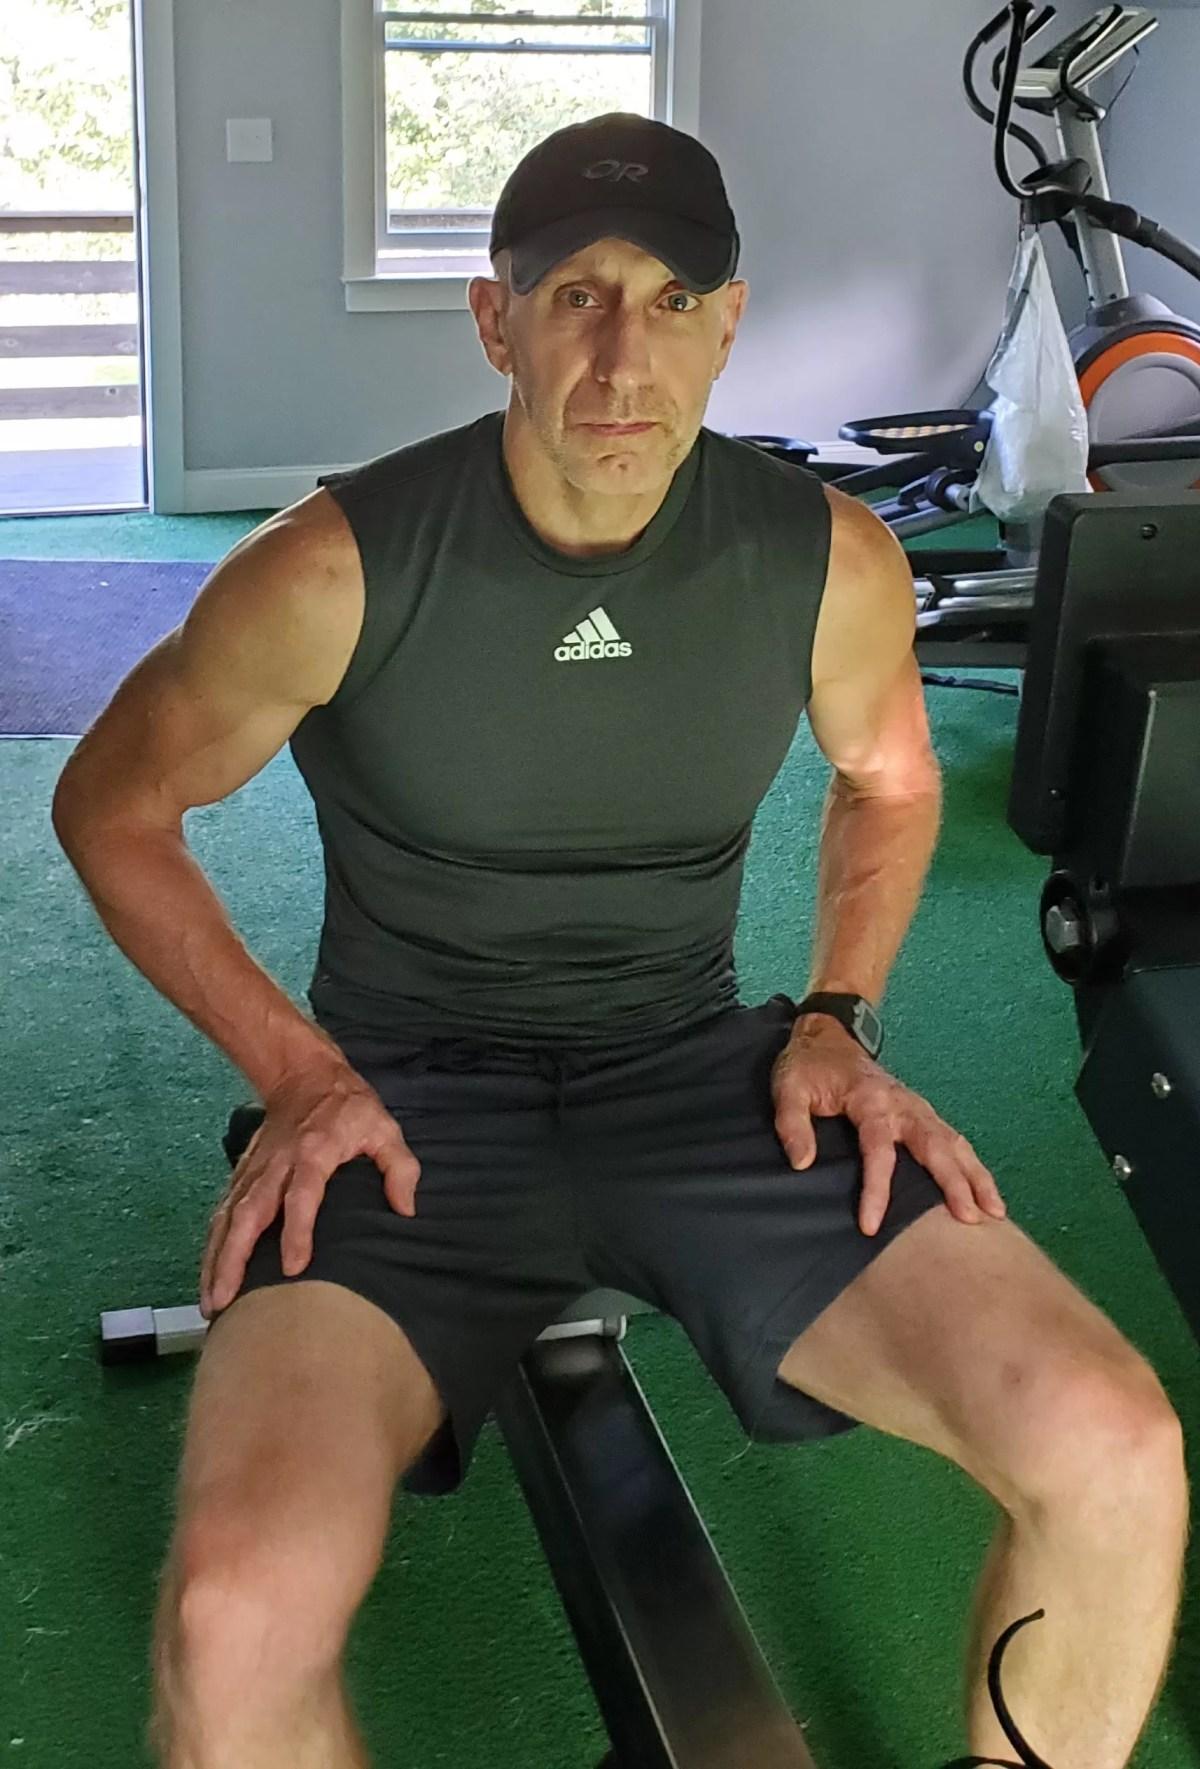 coach bergenroth rowing training plan testimonial